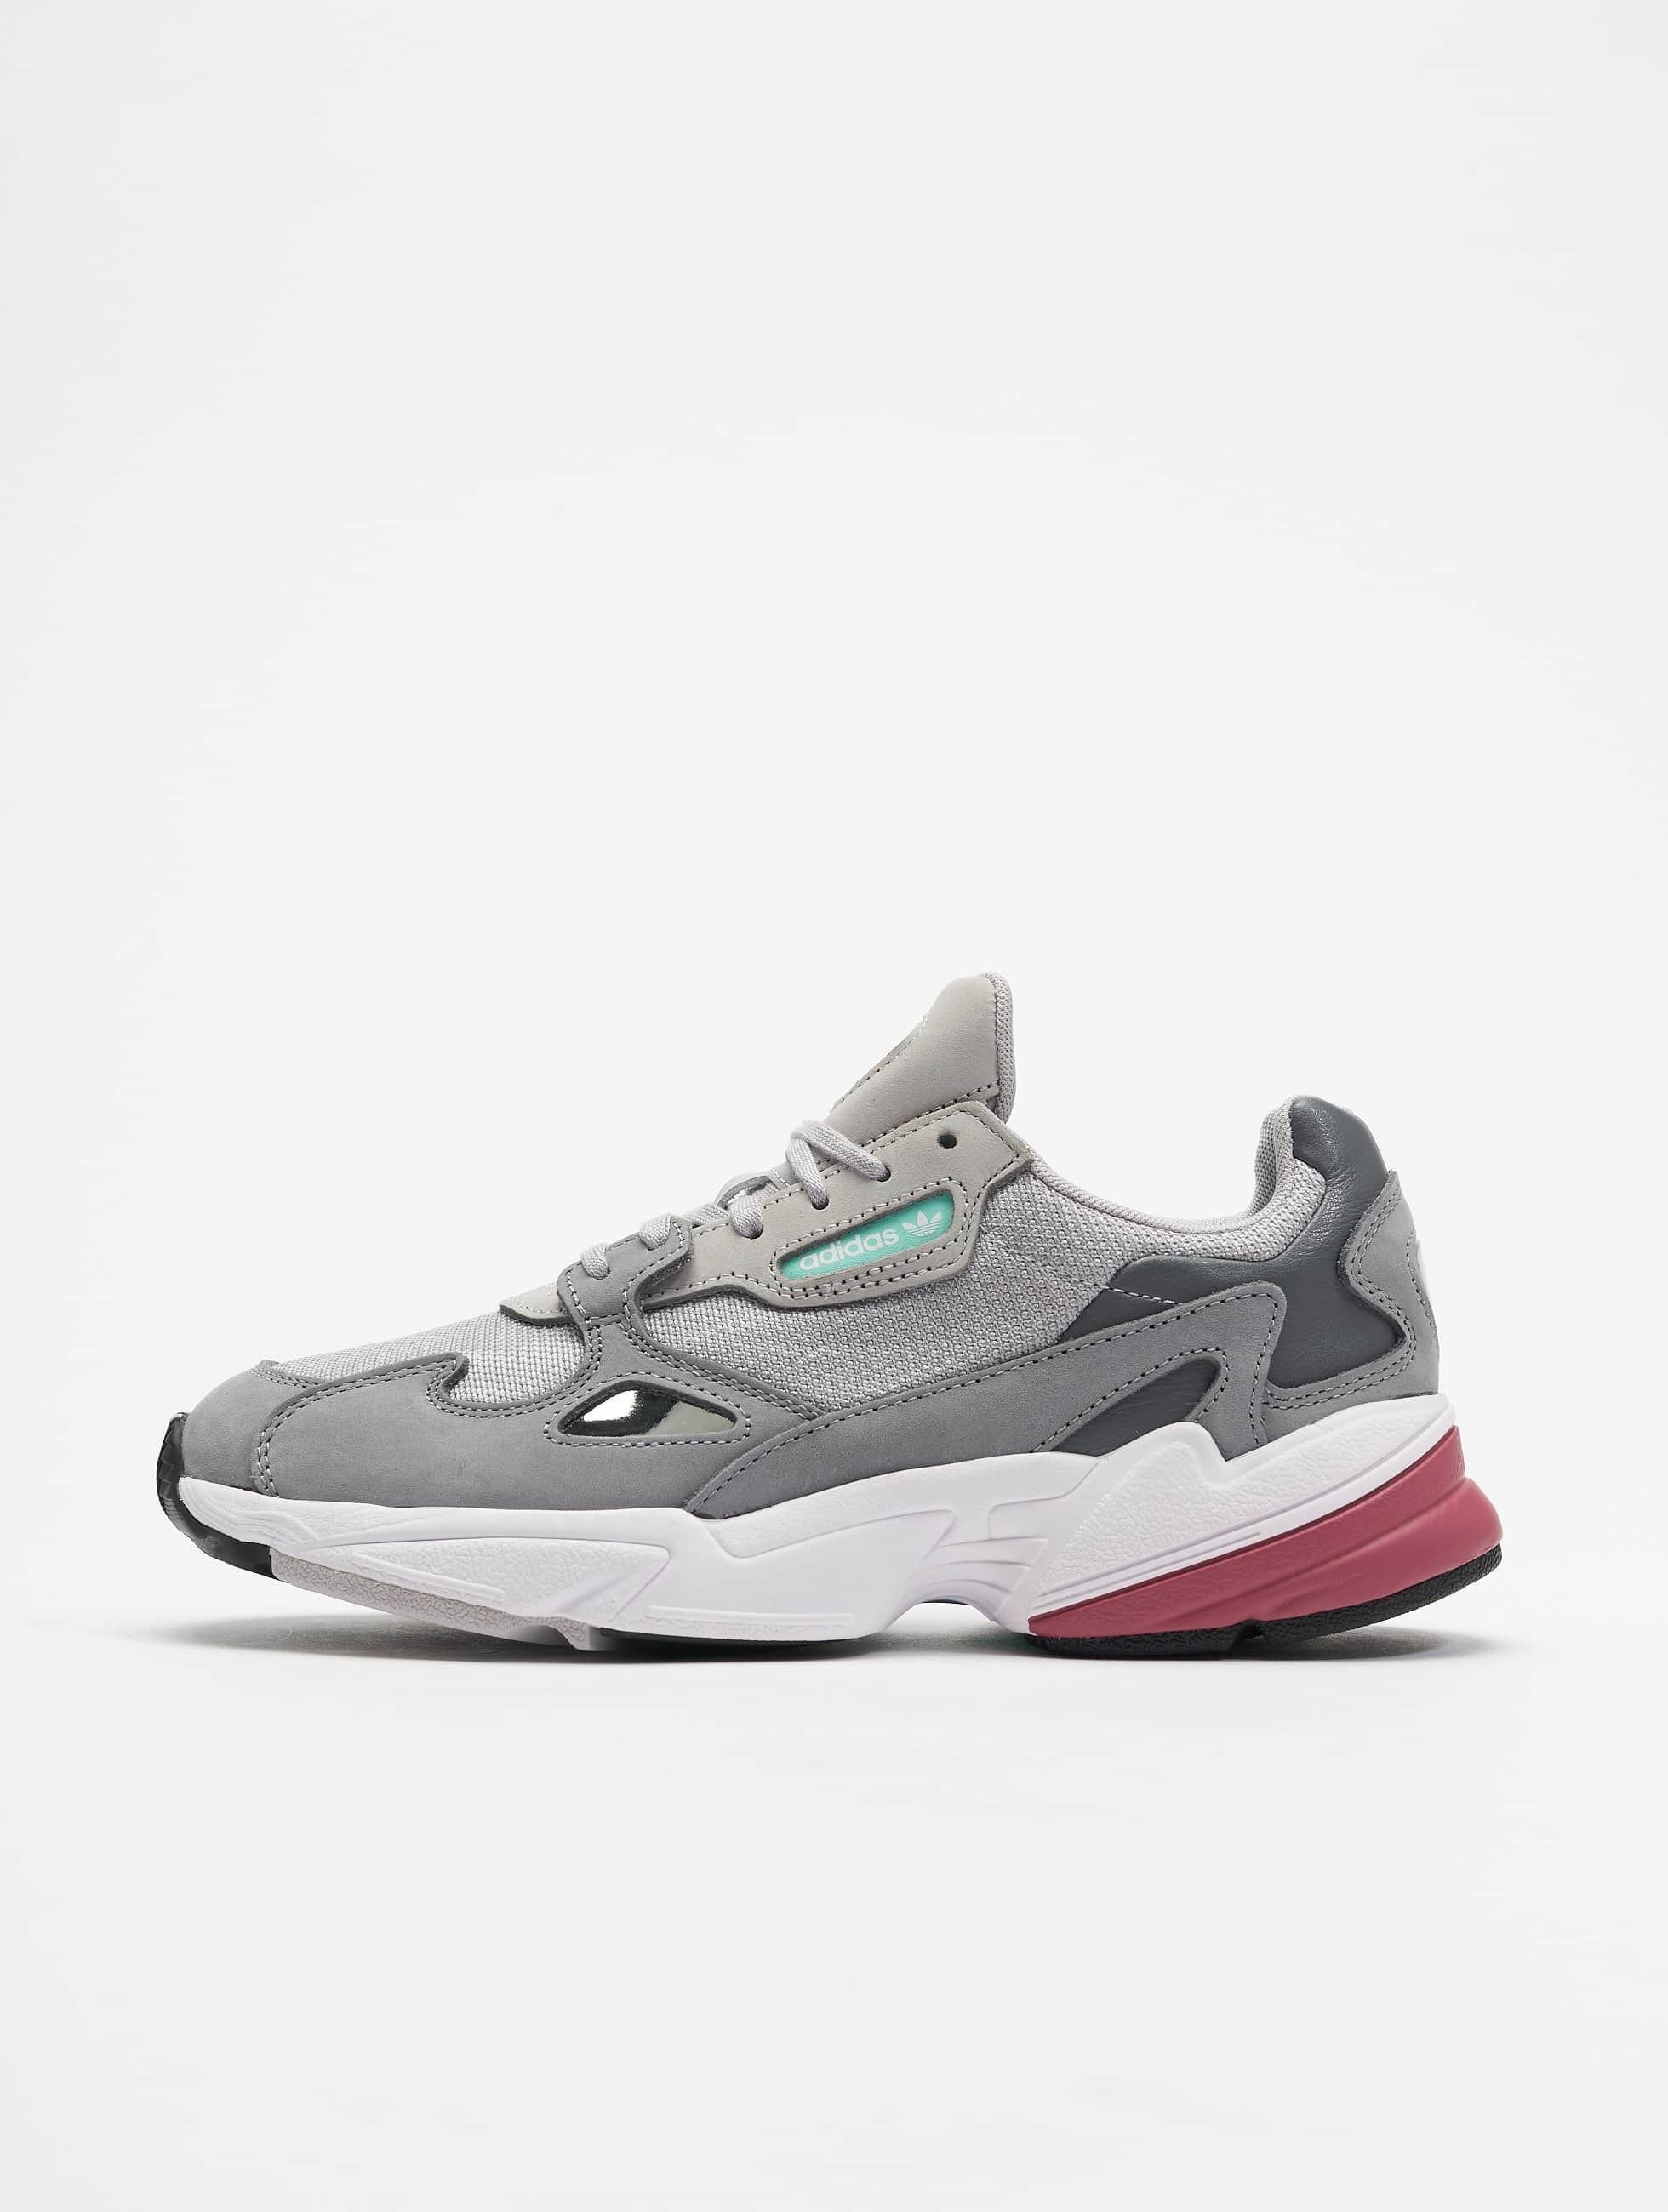 362f14c2c26 adidas originals schoen / sneaker Falcon W in grijs 498380